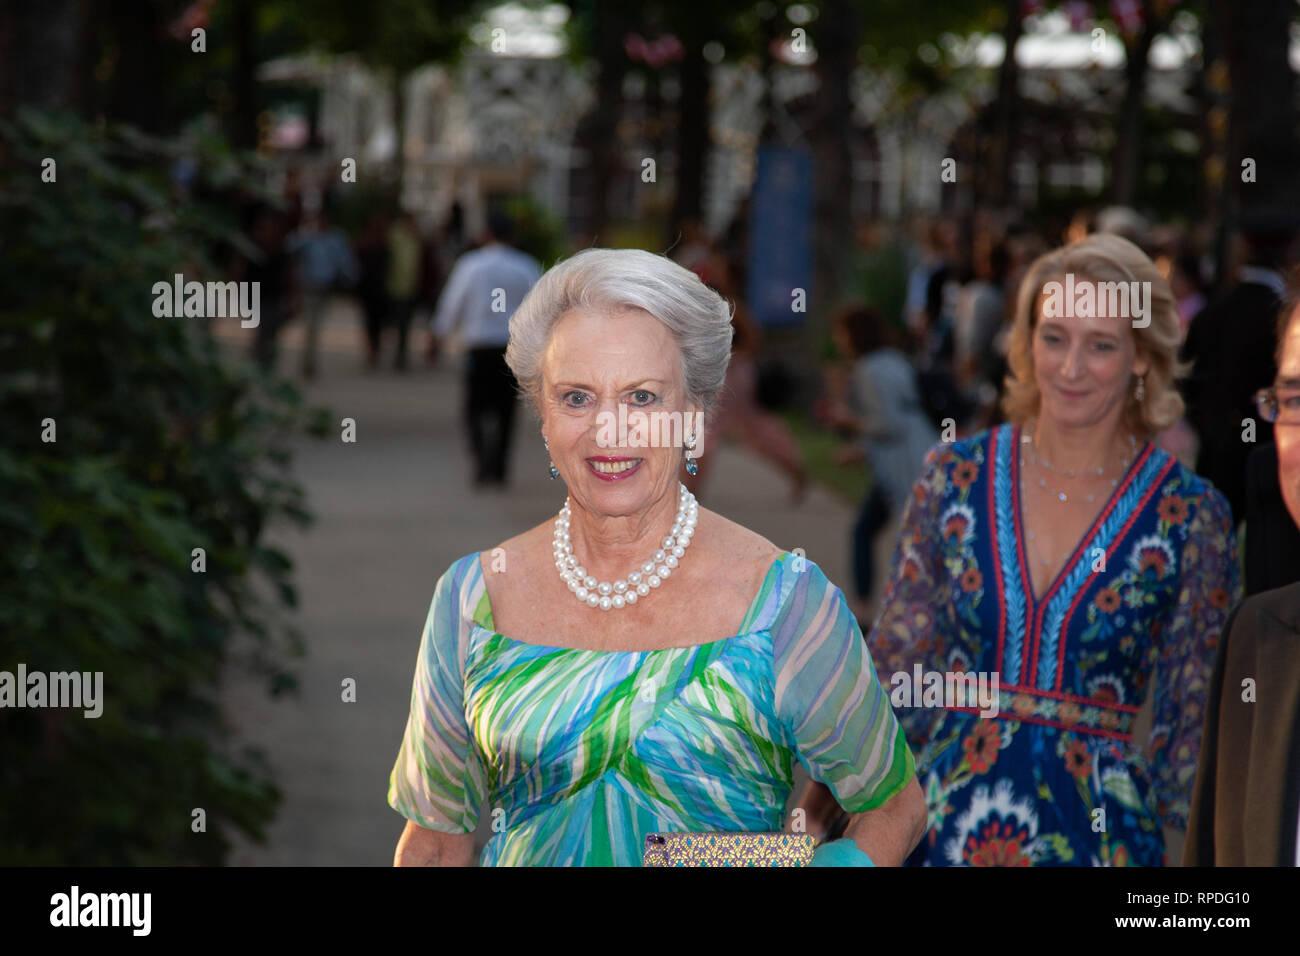 H.K.H. Princess Benedikte in Tivoli, invited to the 175 years jubilée of Tivoli, Copenhagen - Stock Image